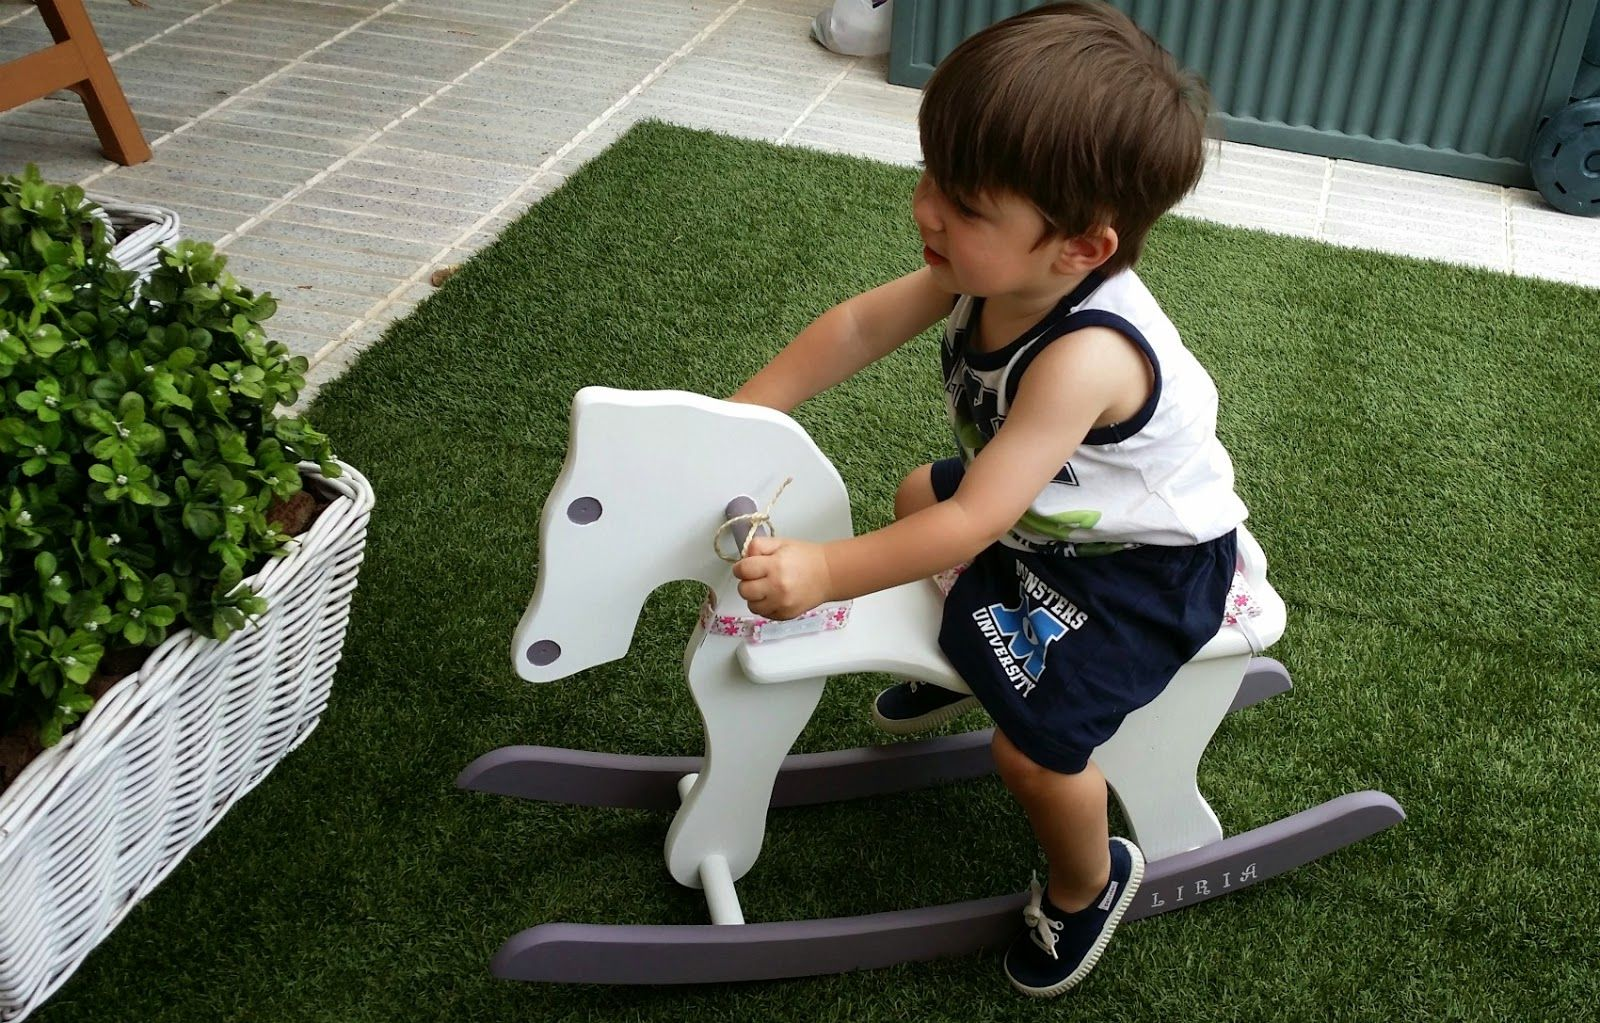 Mi pequeño con un #caballito #mimitoshome personalizado